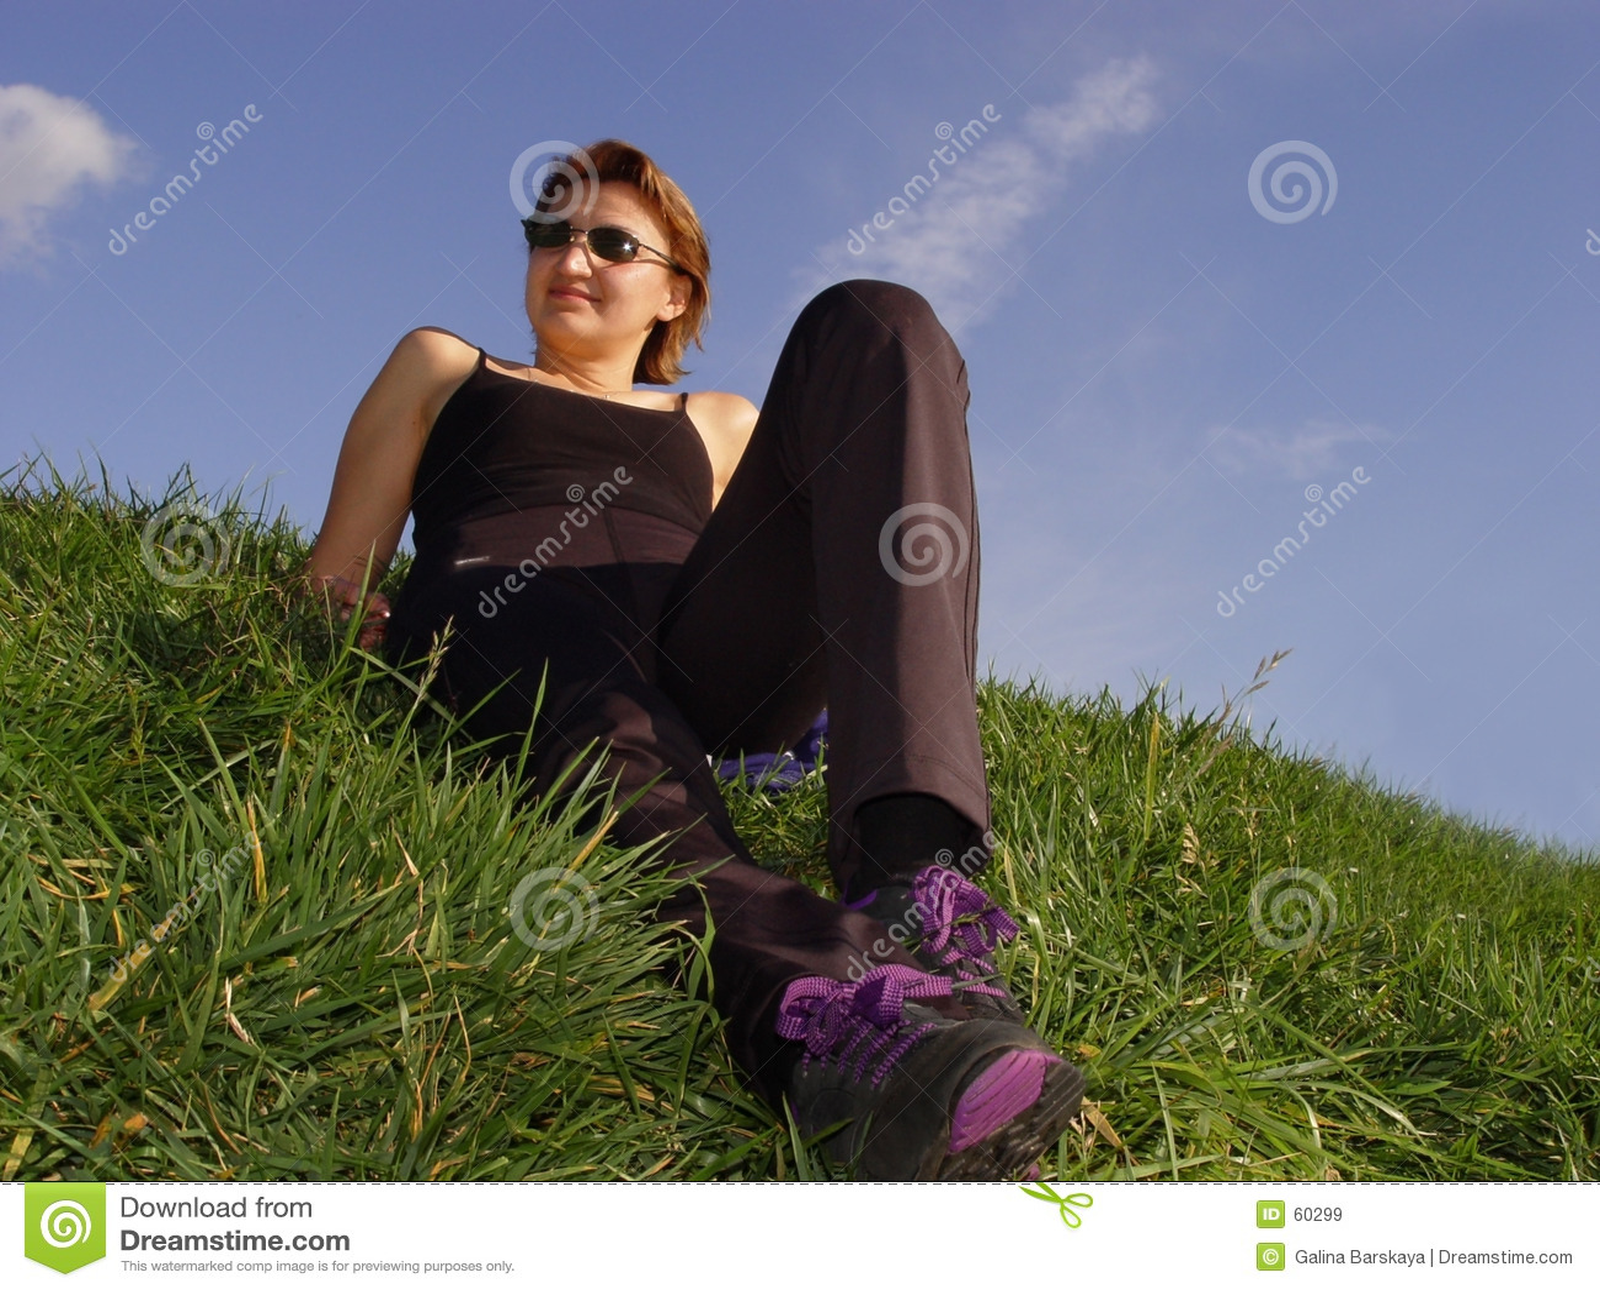 Enjoying life outdoor